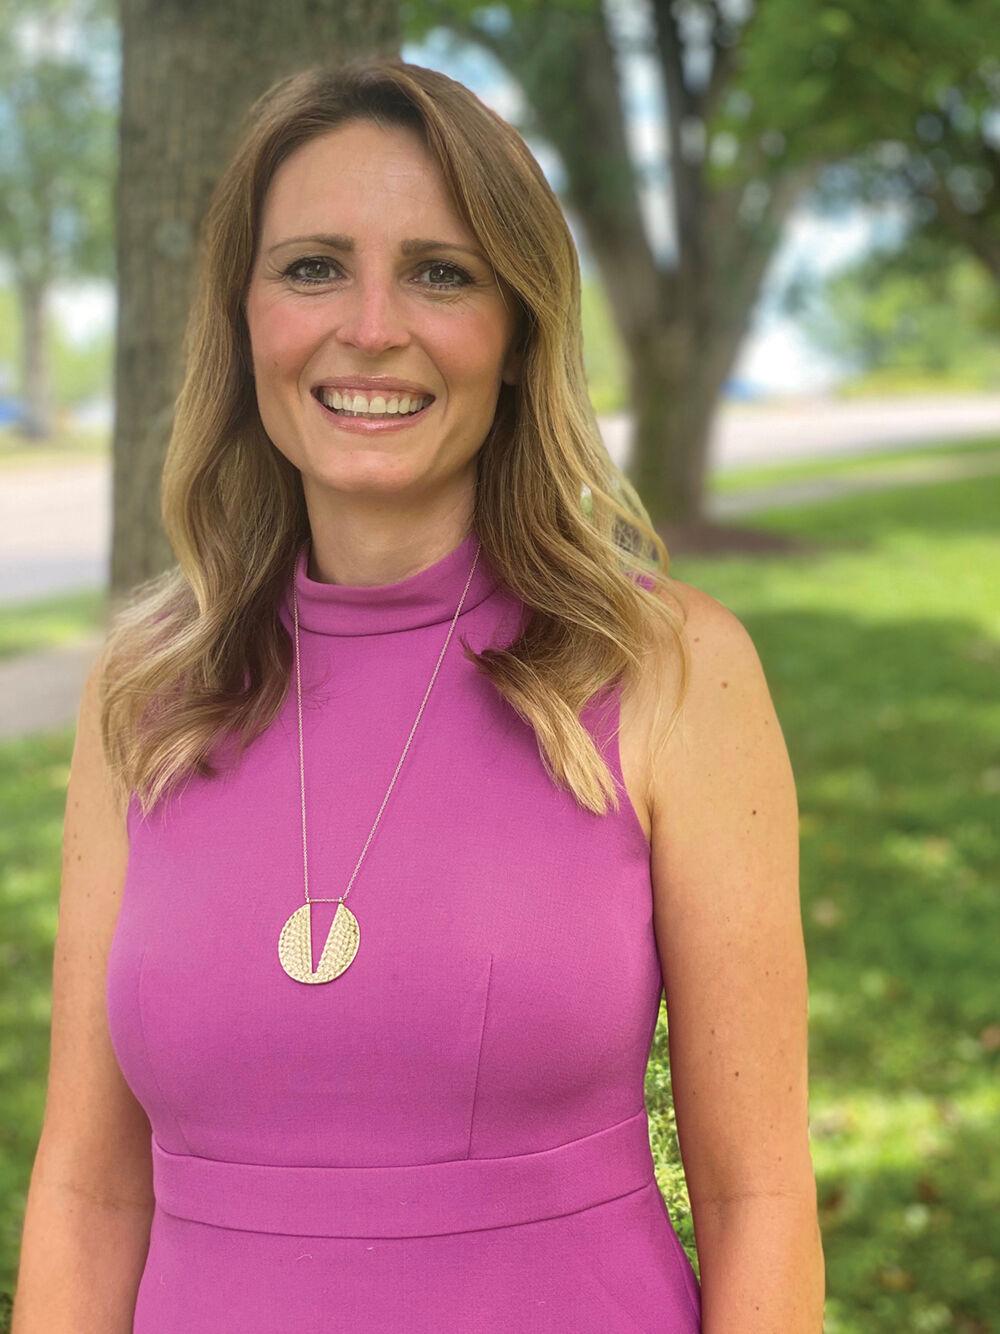 Amy Alexander, Executive Director of the Refuge Center